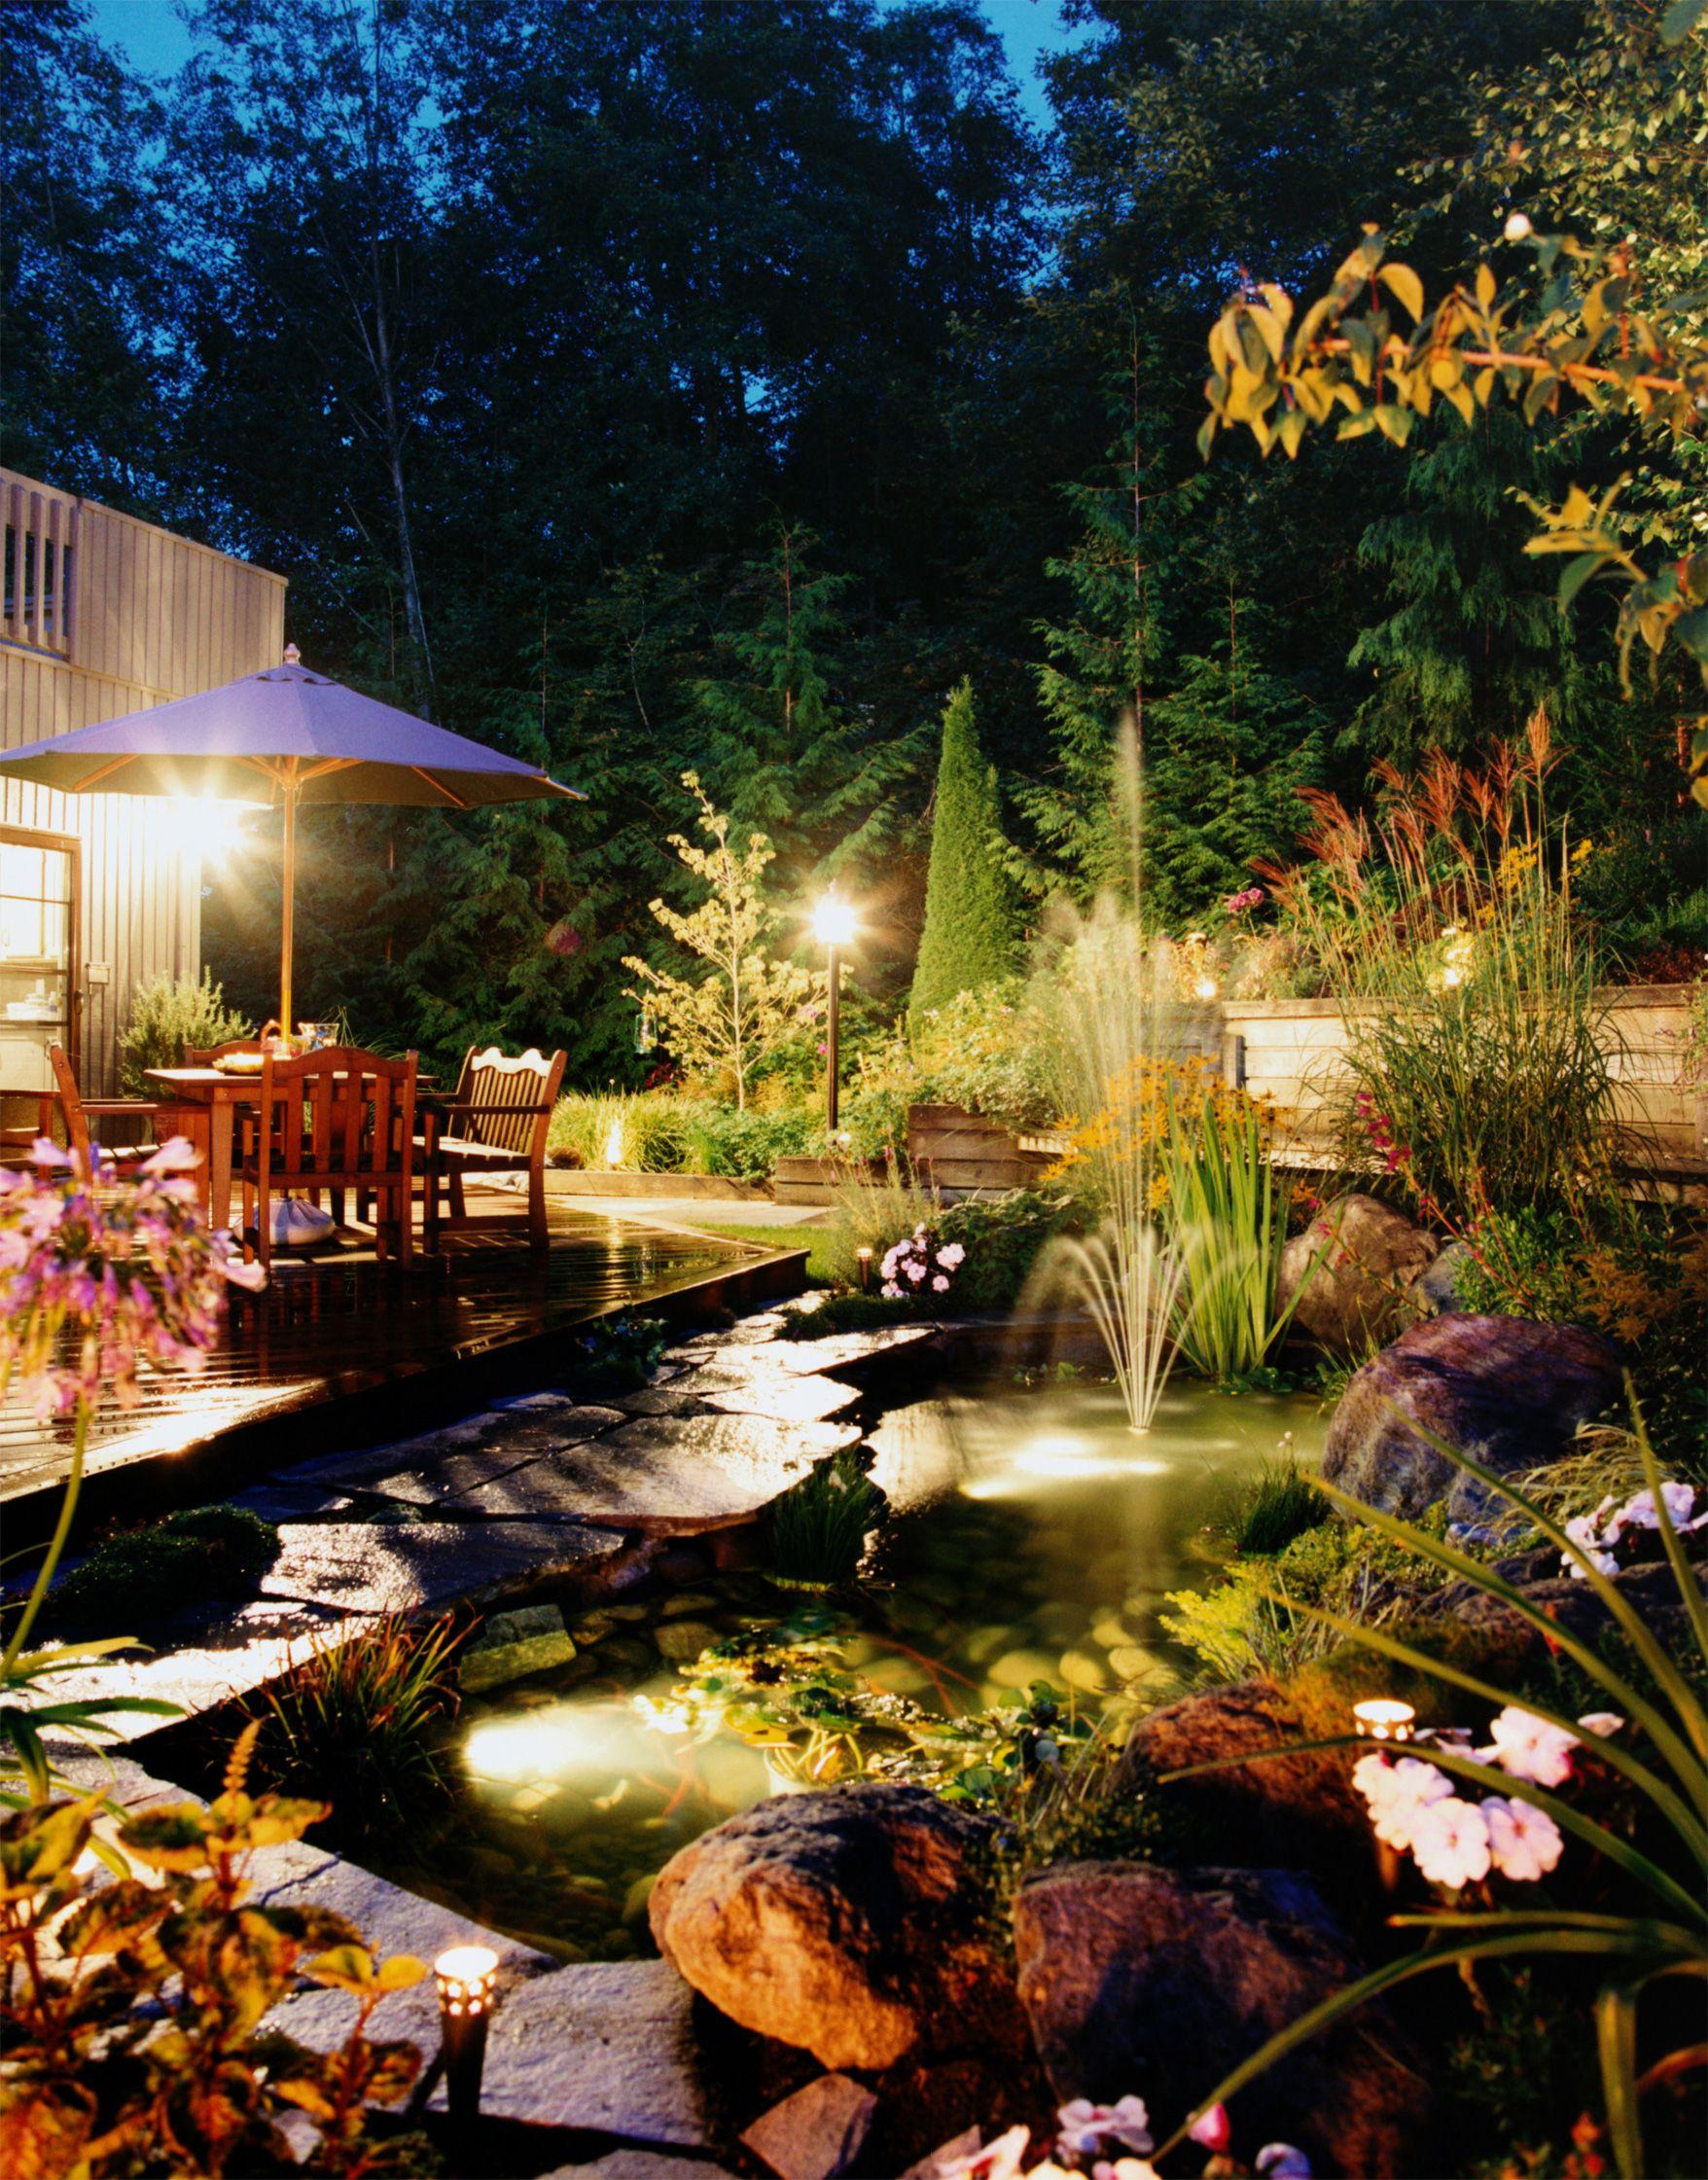 A delightful evening backyard pond scene smartpond pond pond a delightful evening backyard pond scene smartpond pond mozeypictures Images